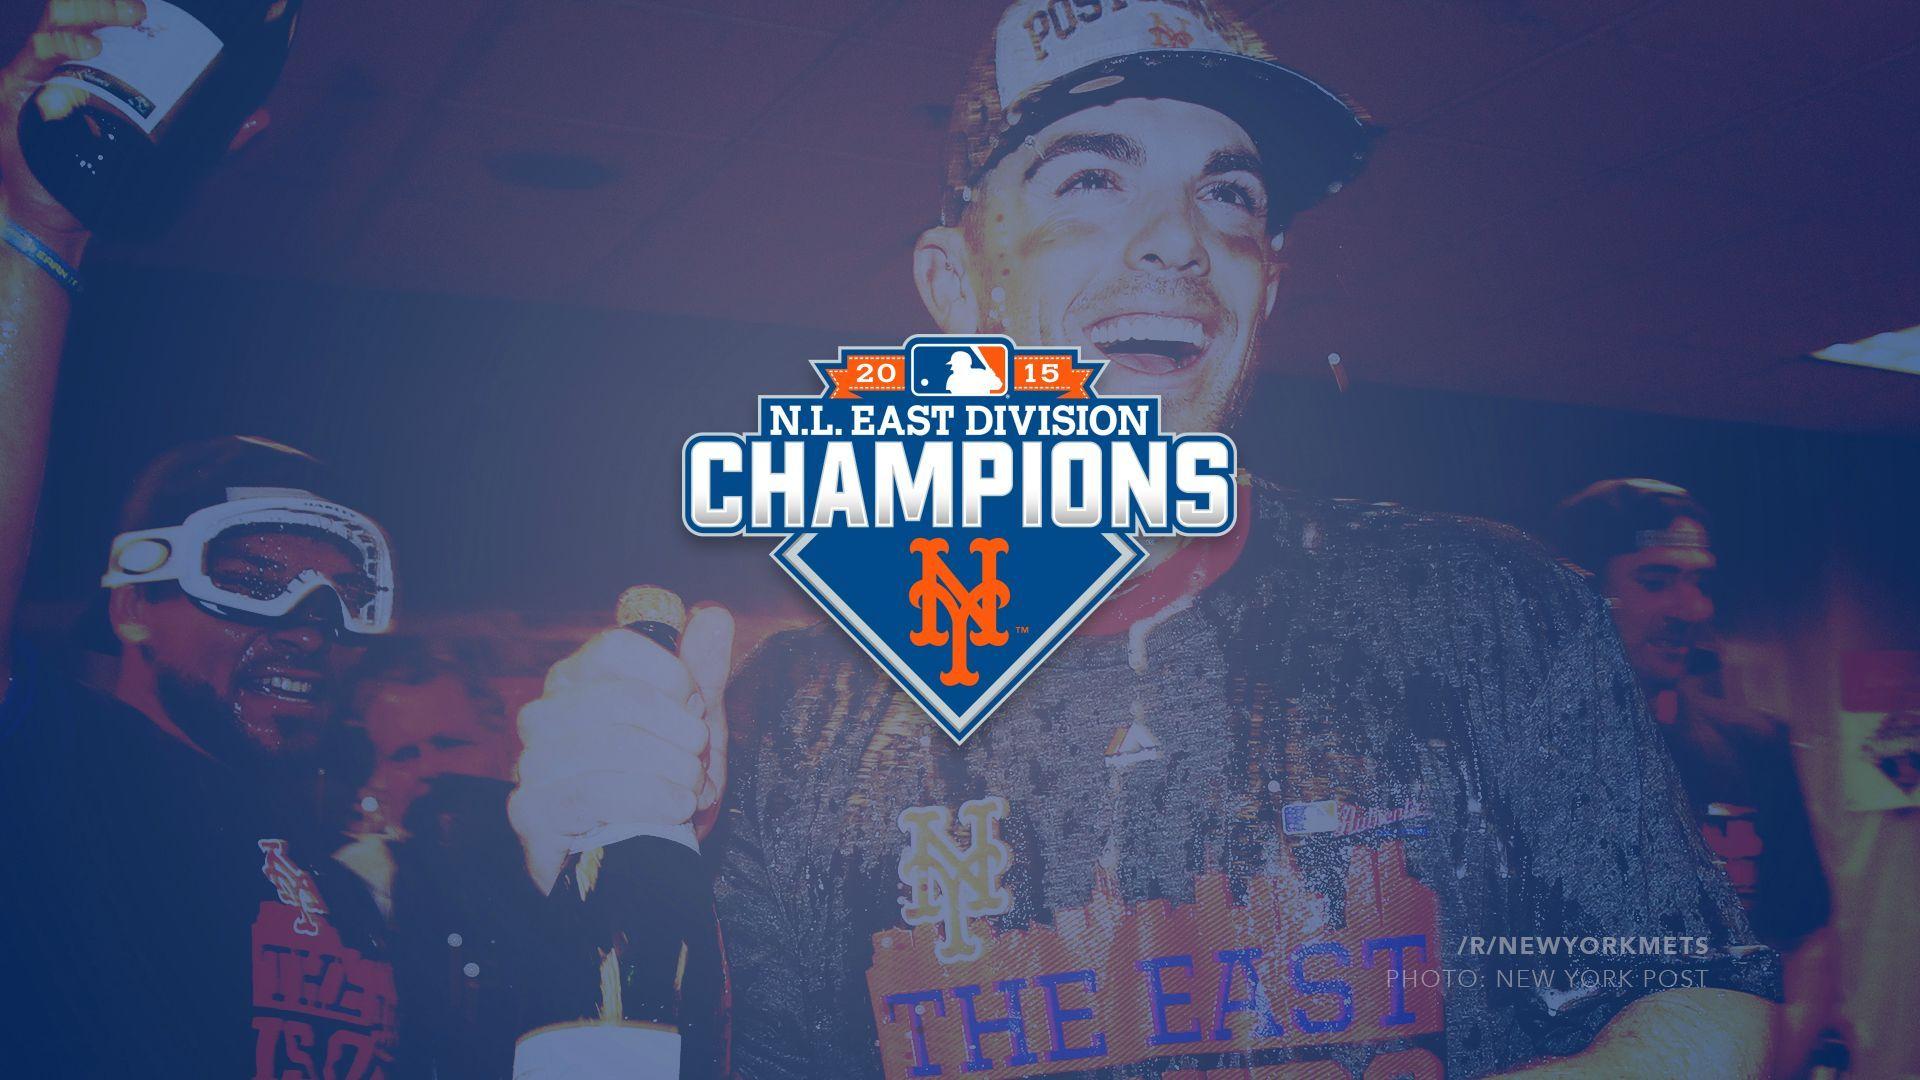 New York Mets 2015 NL East Champs Wallpaper